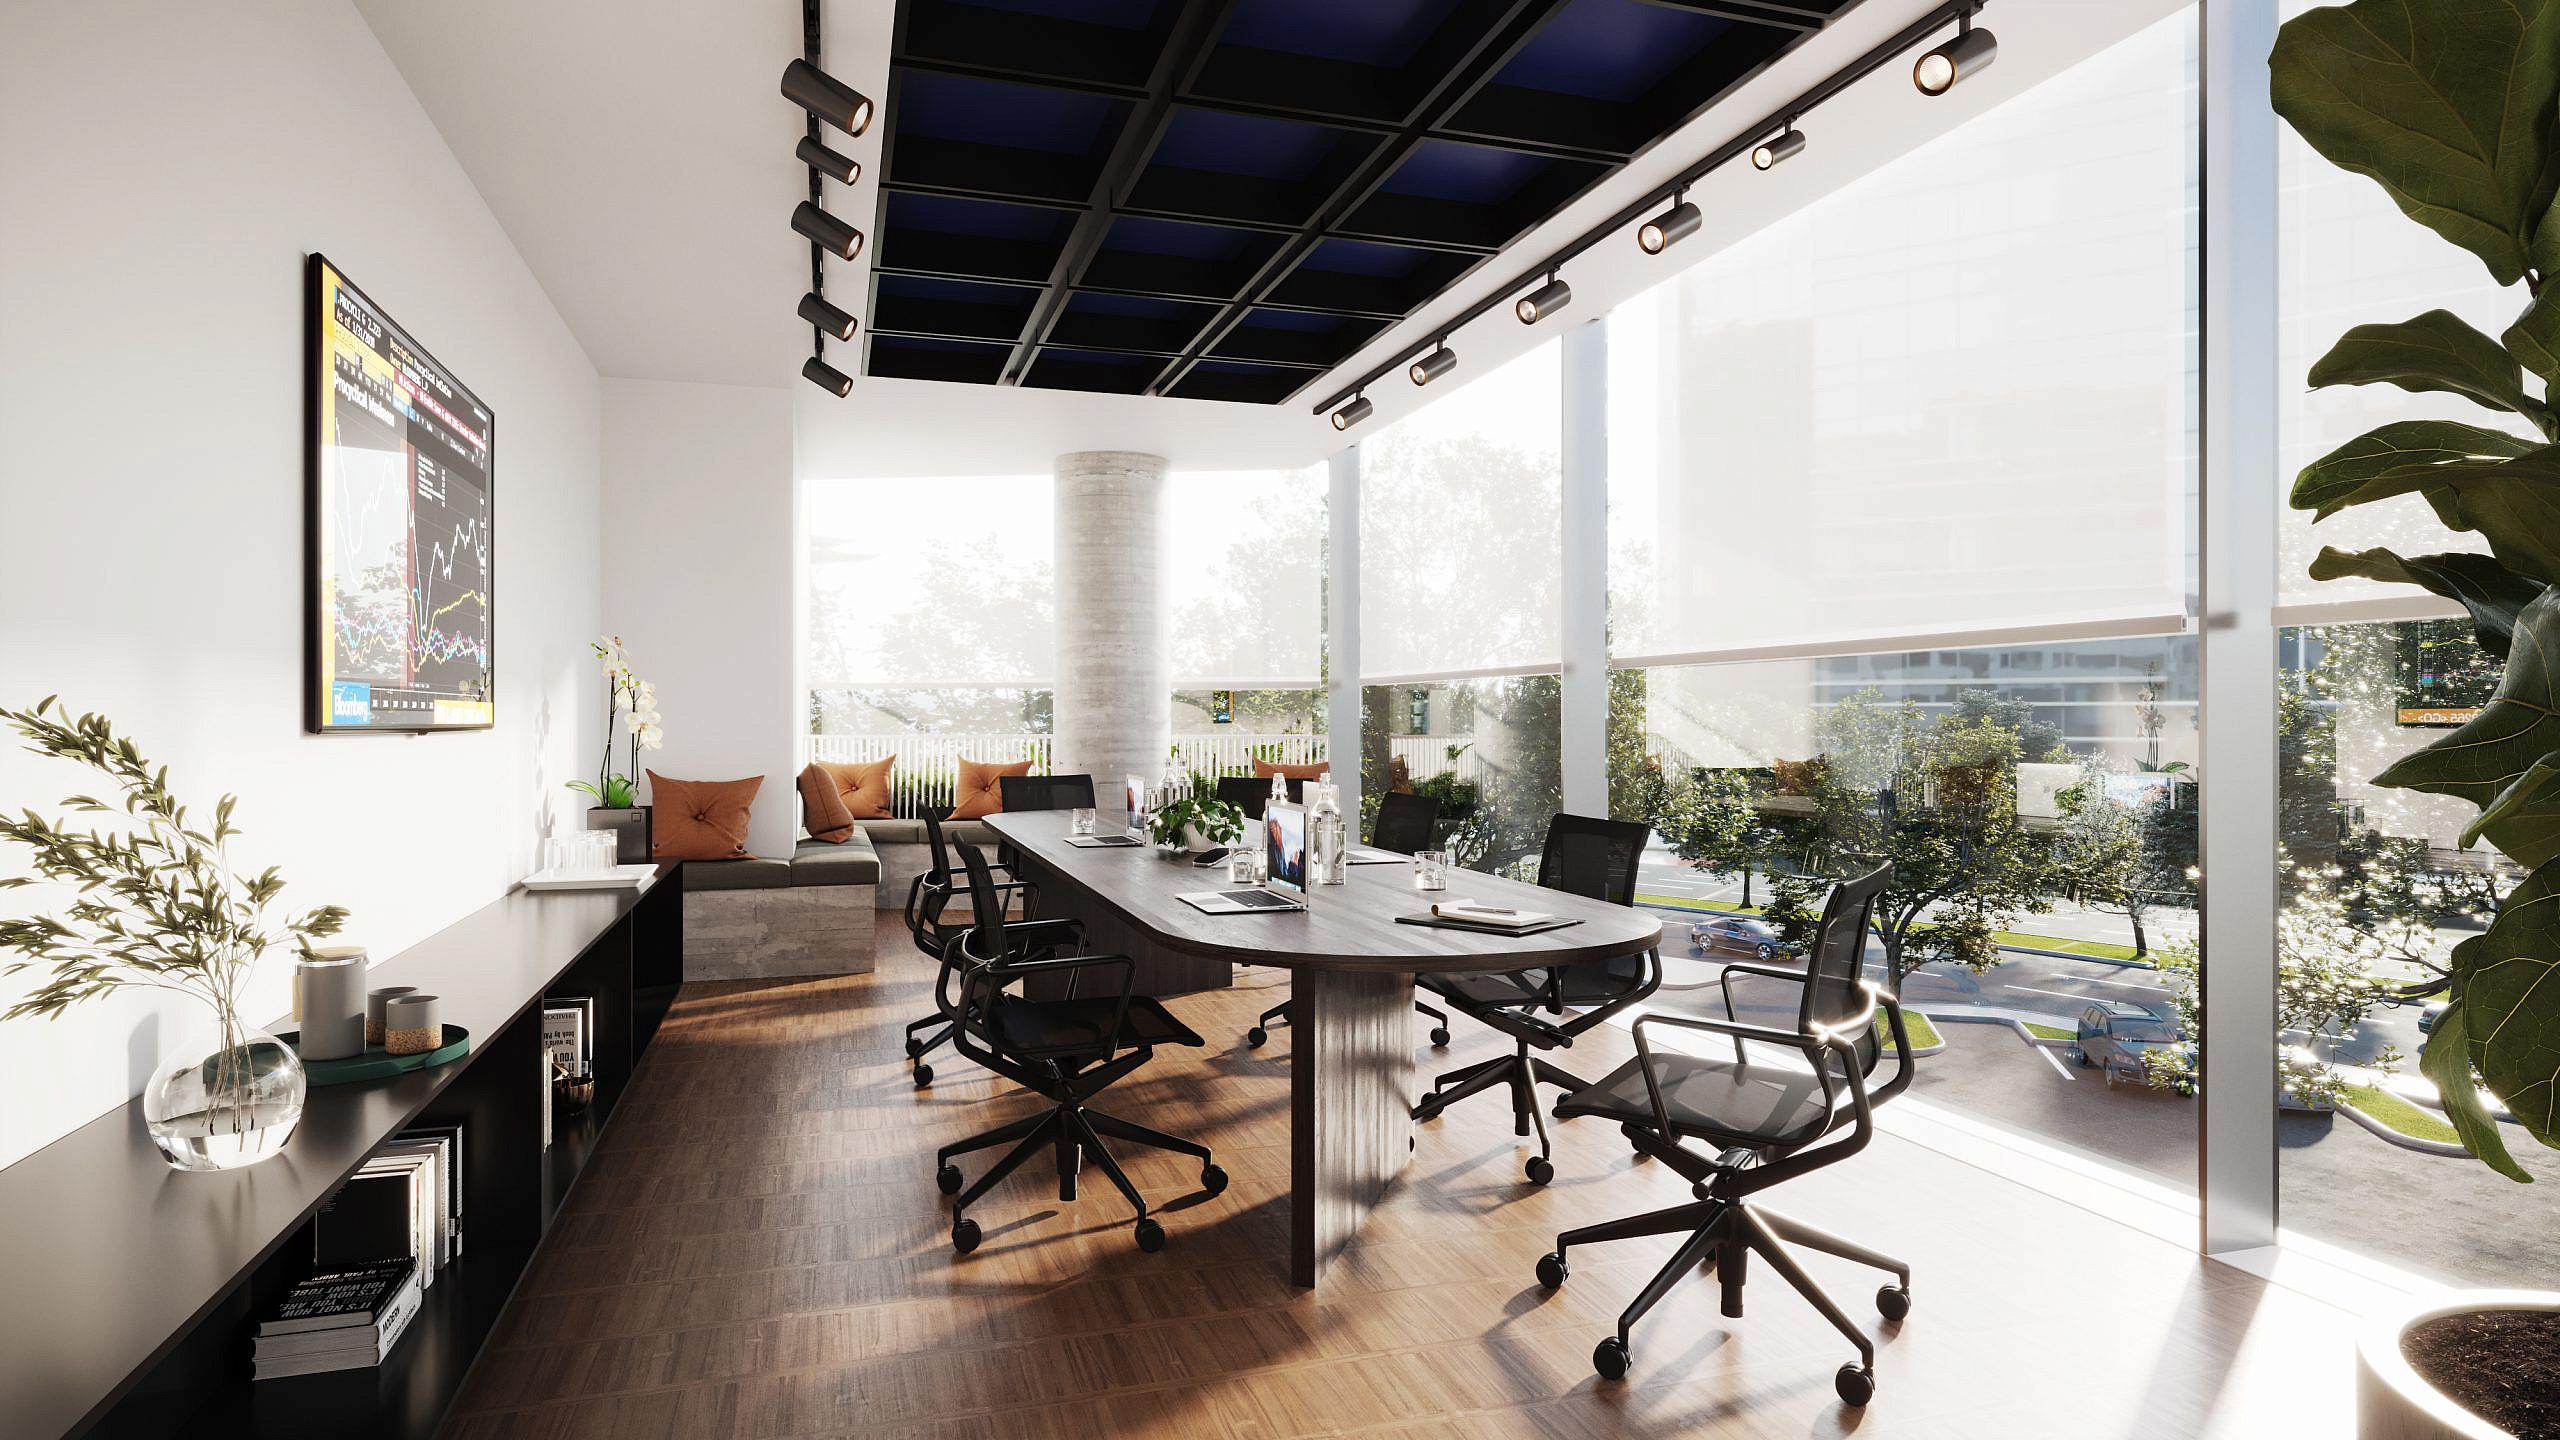 3D Rendering | Architectural Visualisation CGI | Line Creative